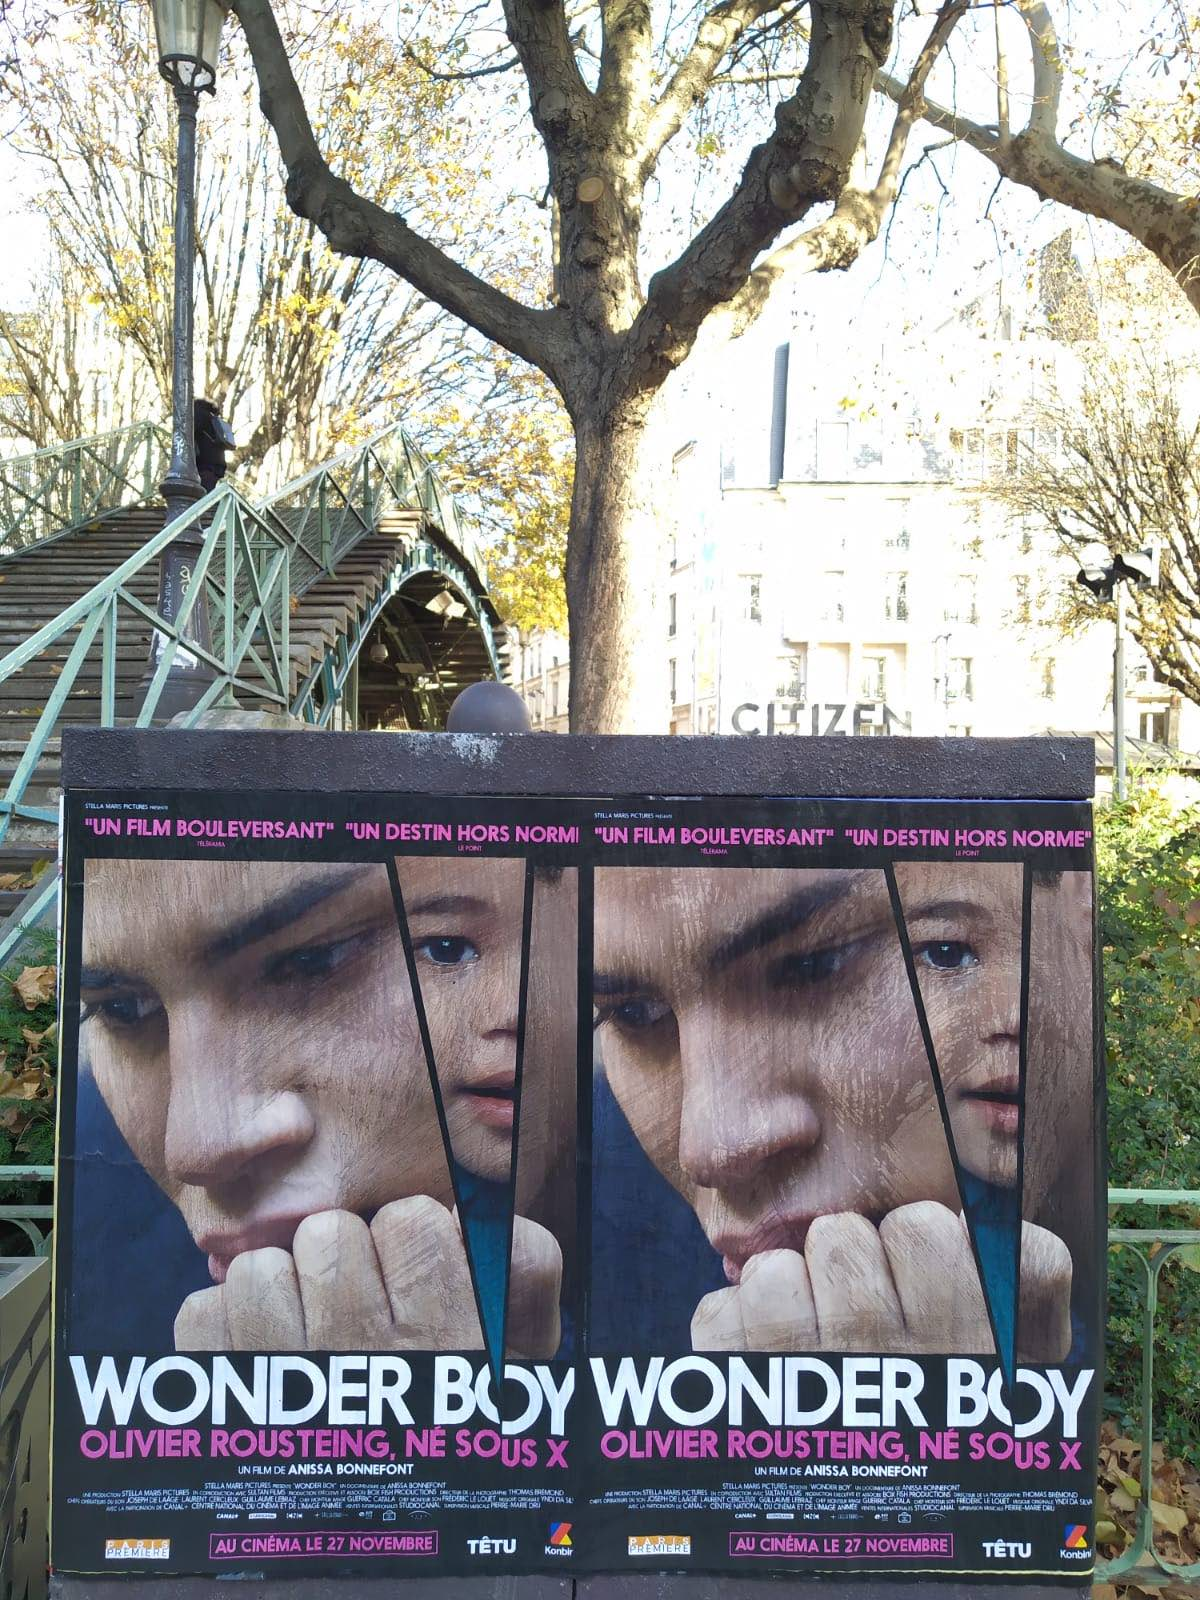 Wonder Boy, Olivier Roustaing, Né sous X-2